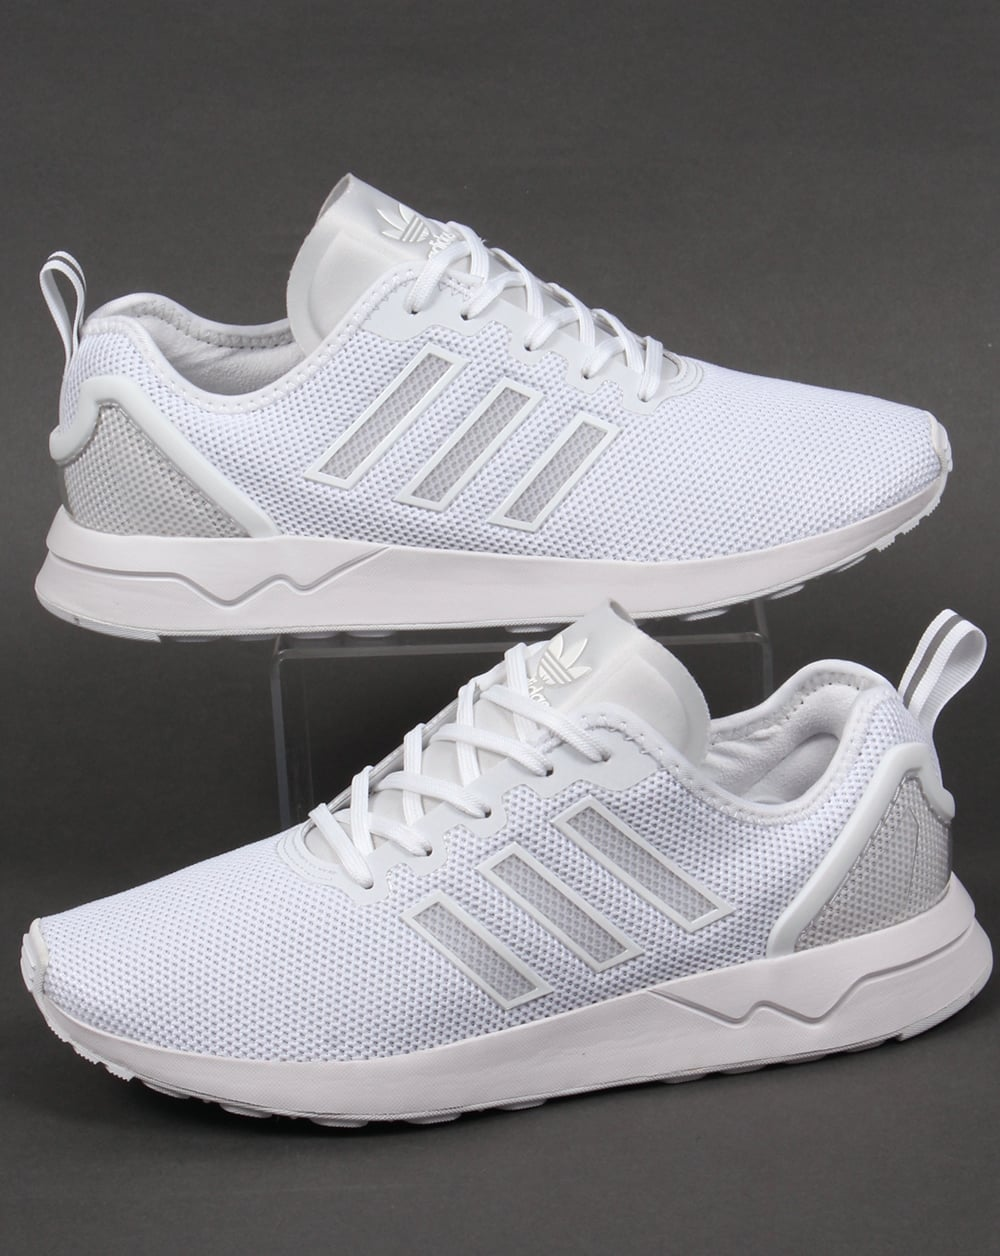 juego corrupción resultado  Adidas ZX Flux ADV Trainers White/White,originals,mens,shoes,runners